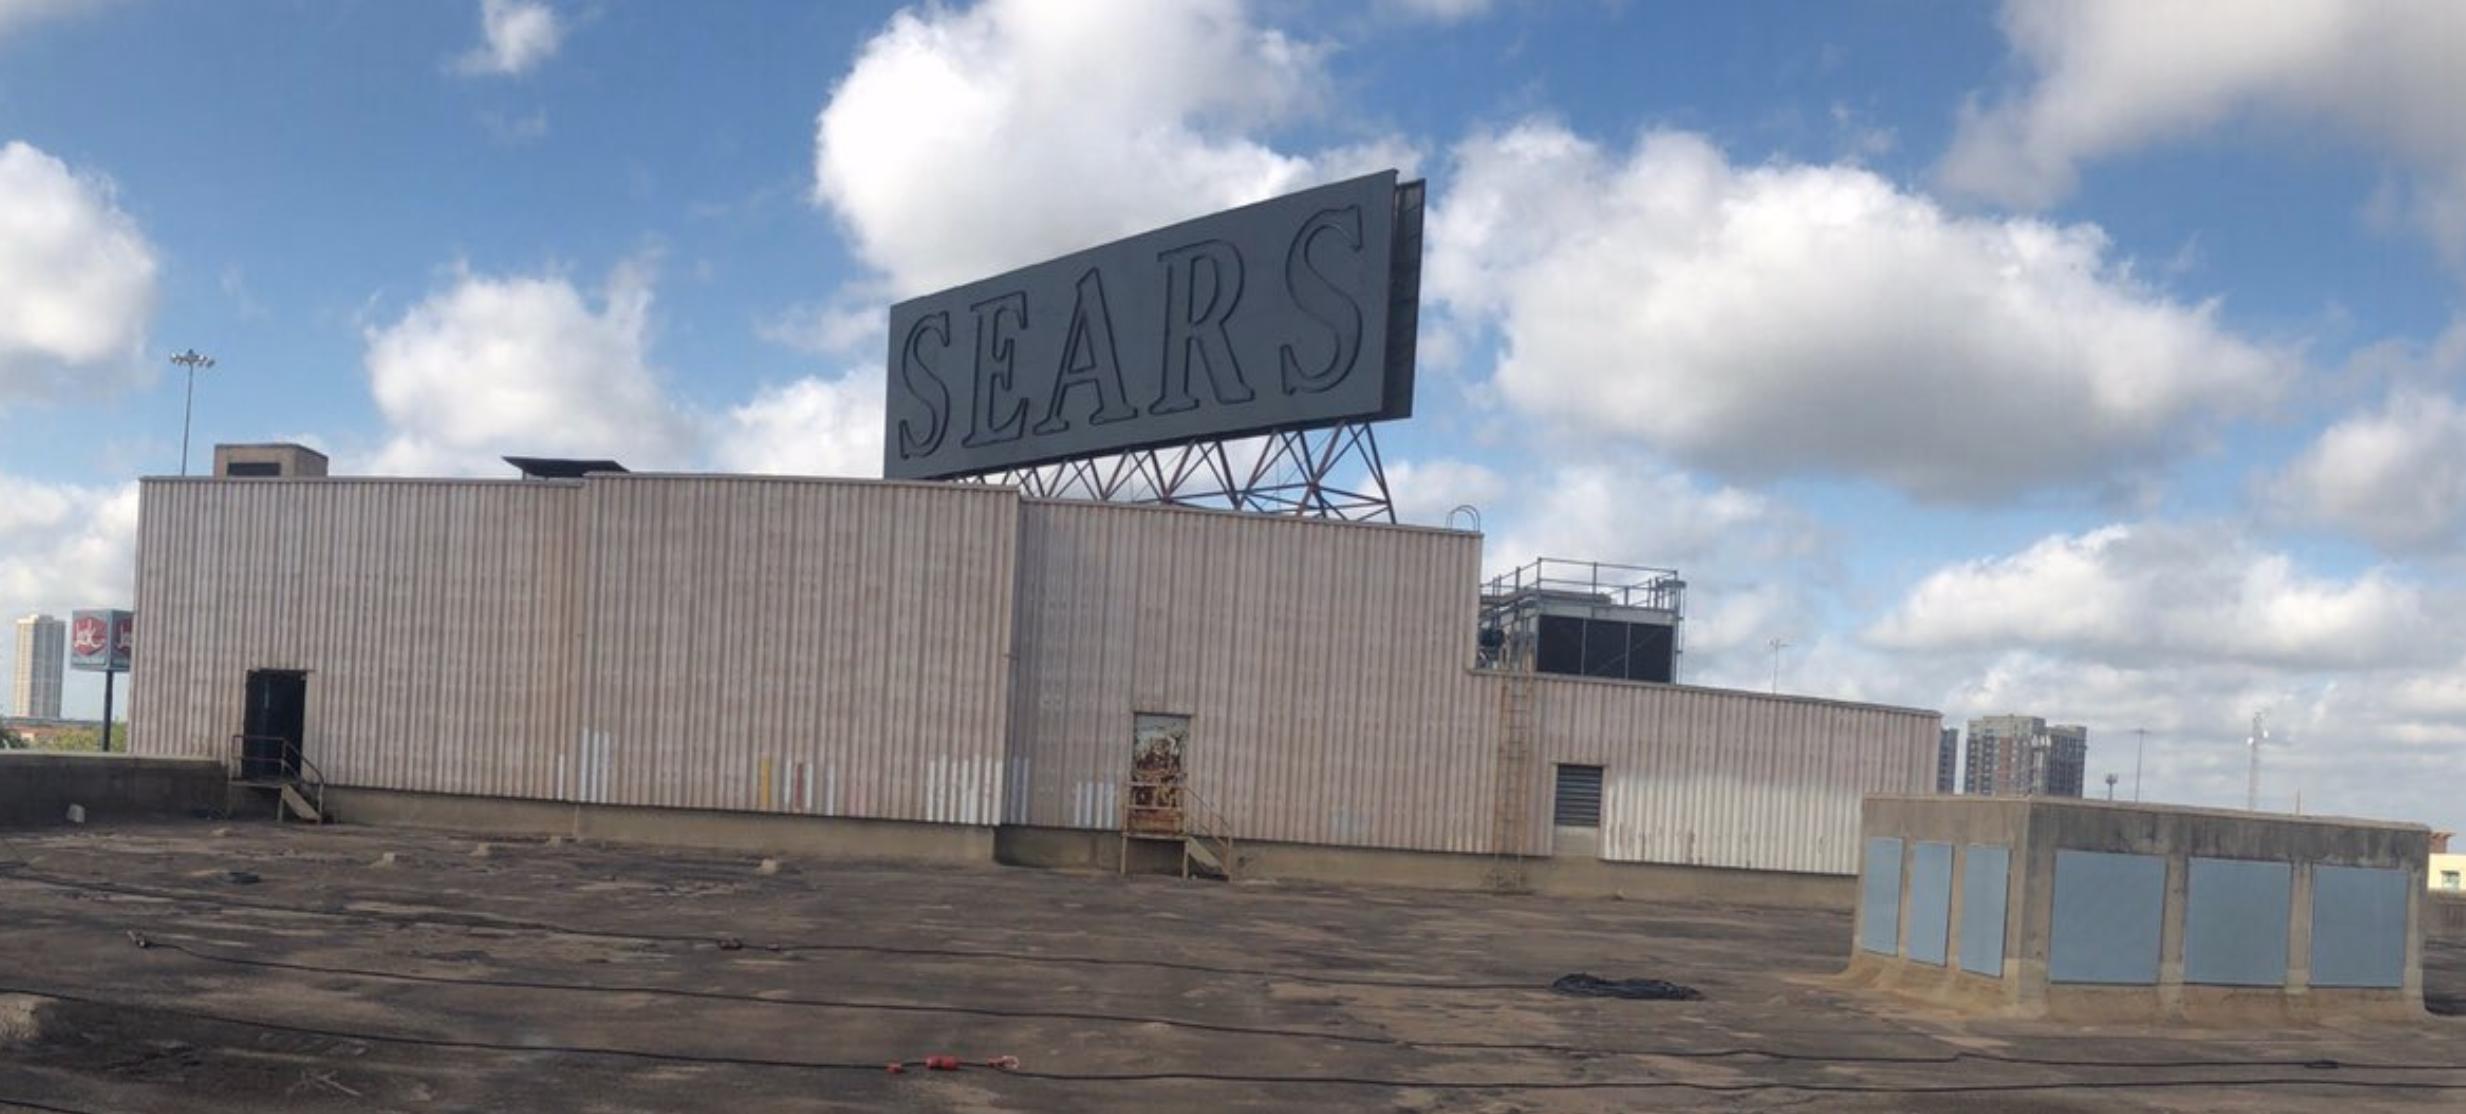 「Sears」商場是休士頓市中心地標建築。(休士頓市政府提供)